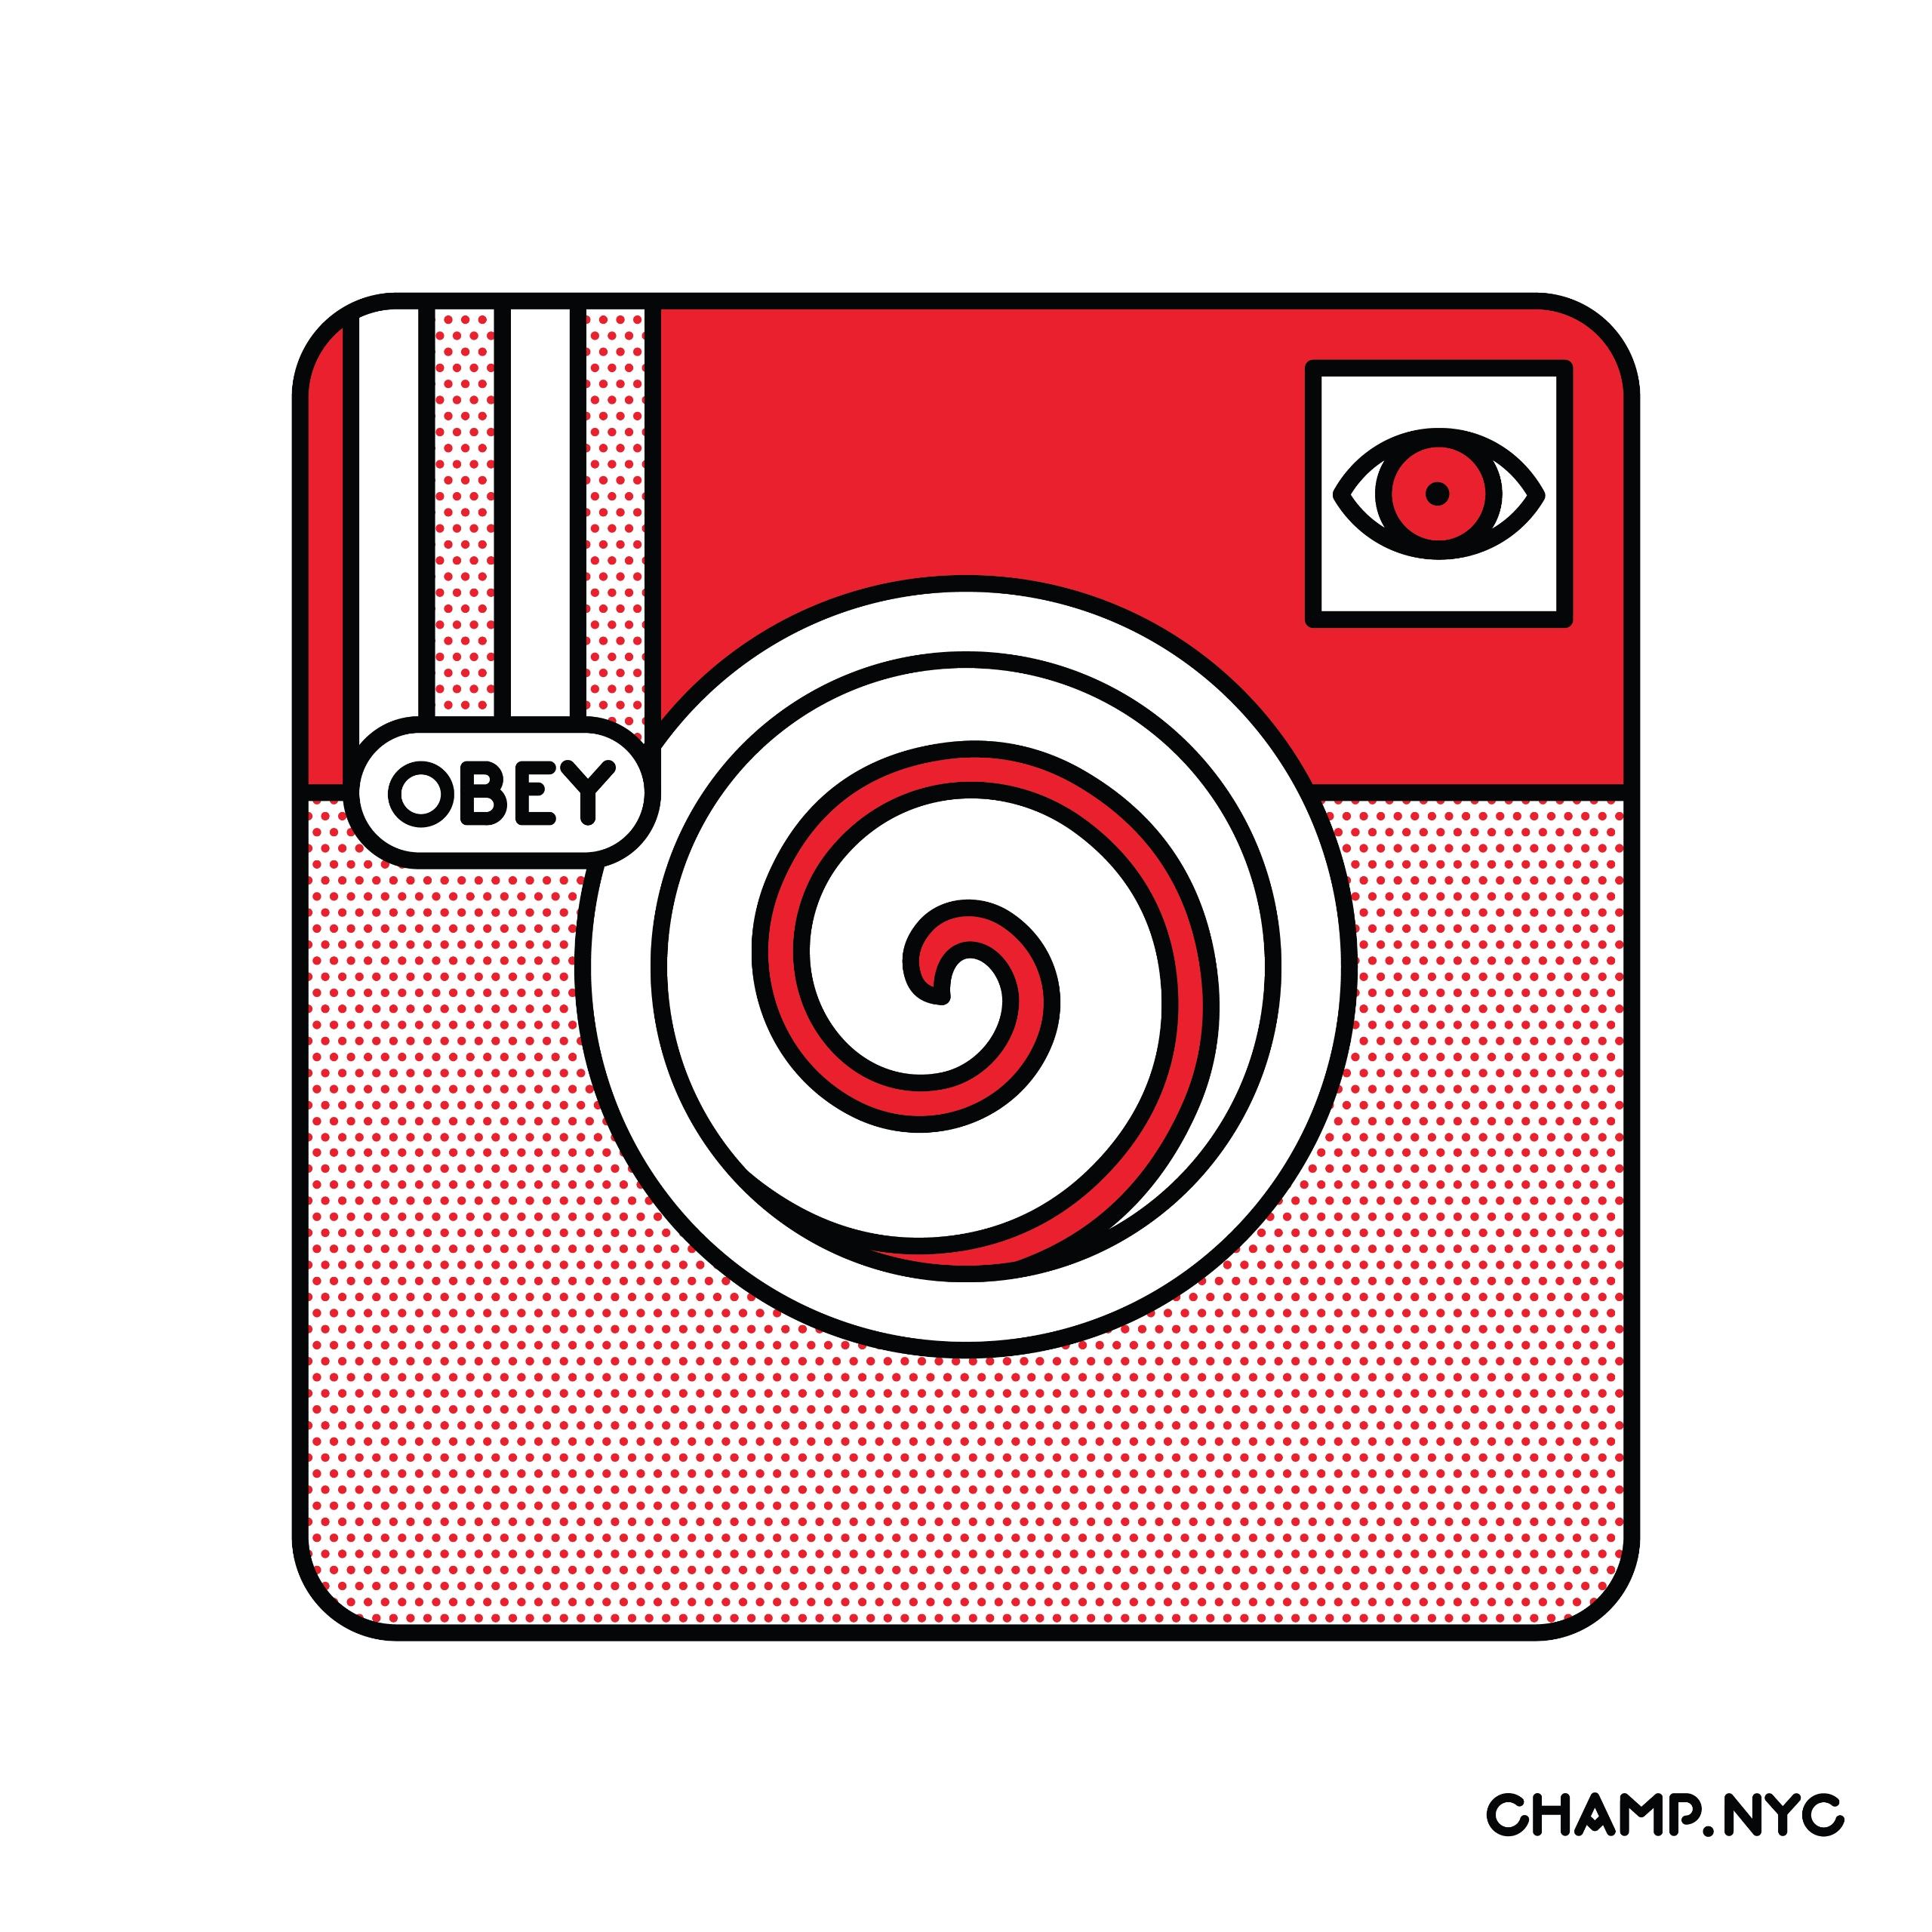 infamous Champ.nyc York City-ba - champnyc | ello